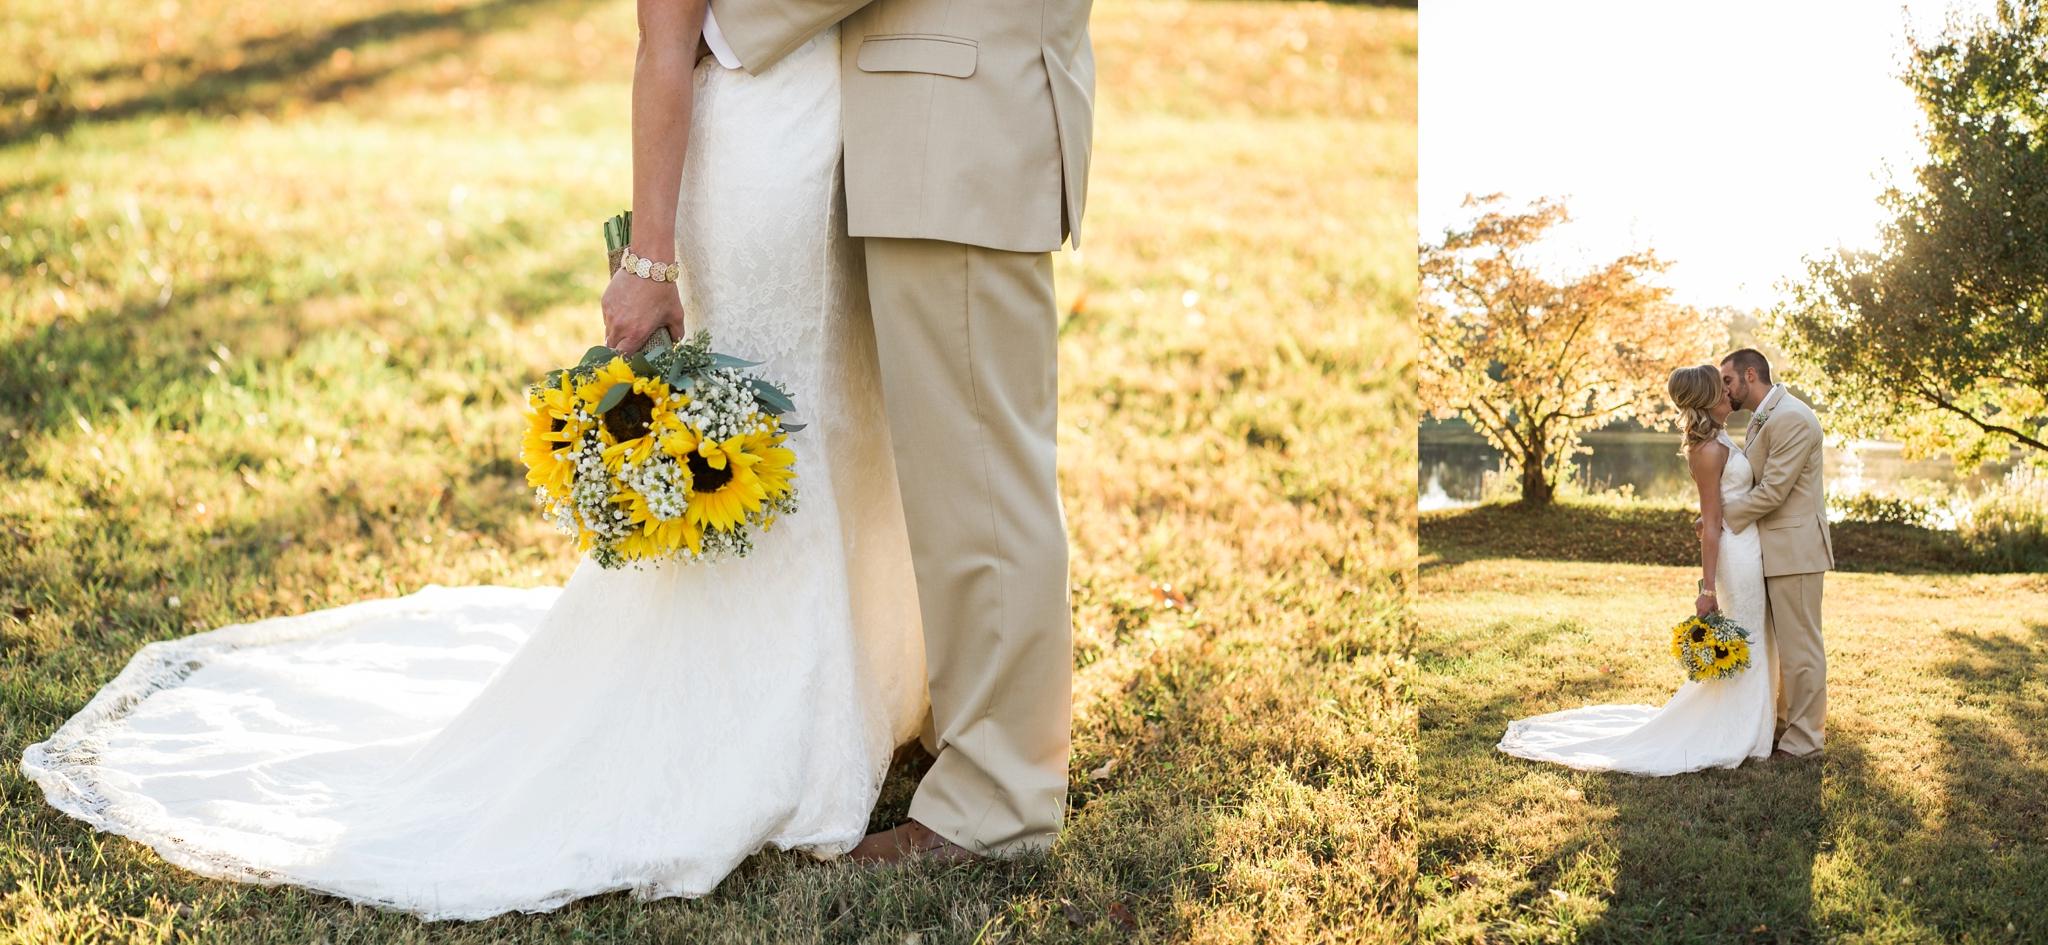 St Louis Wedding Photographer_0713.jpg